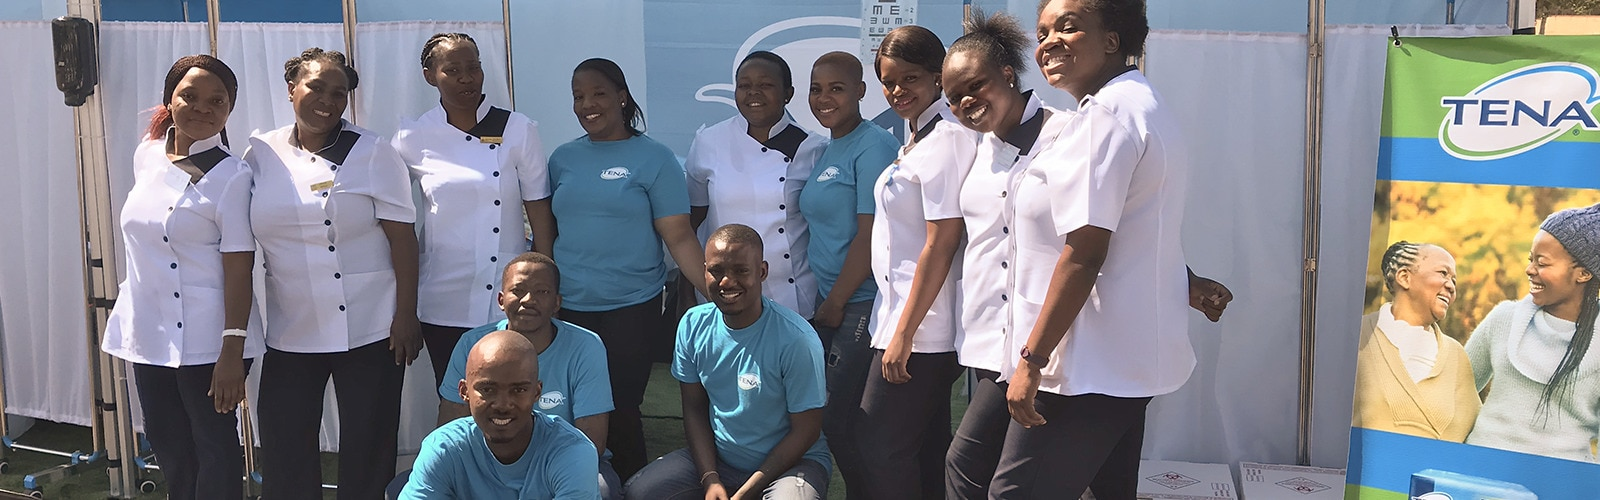 TENA-team in Banakekele